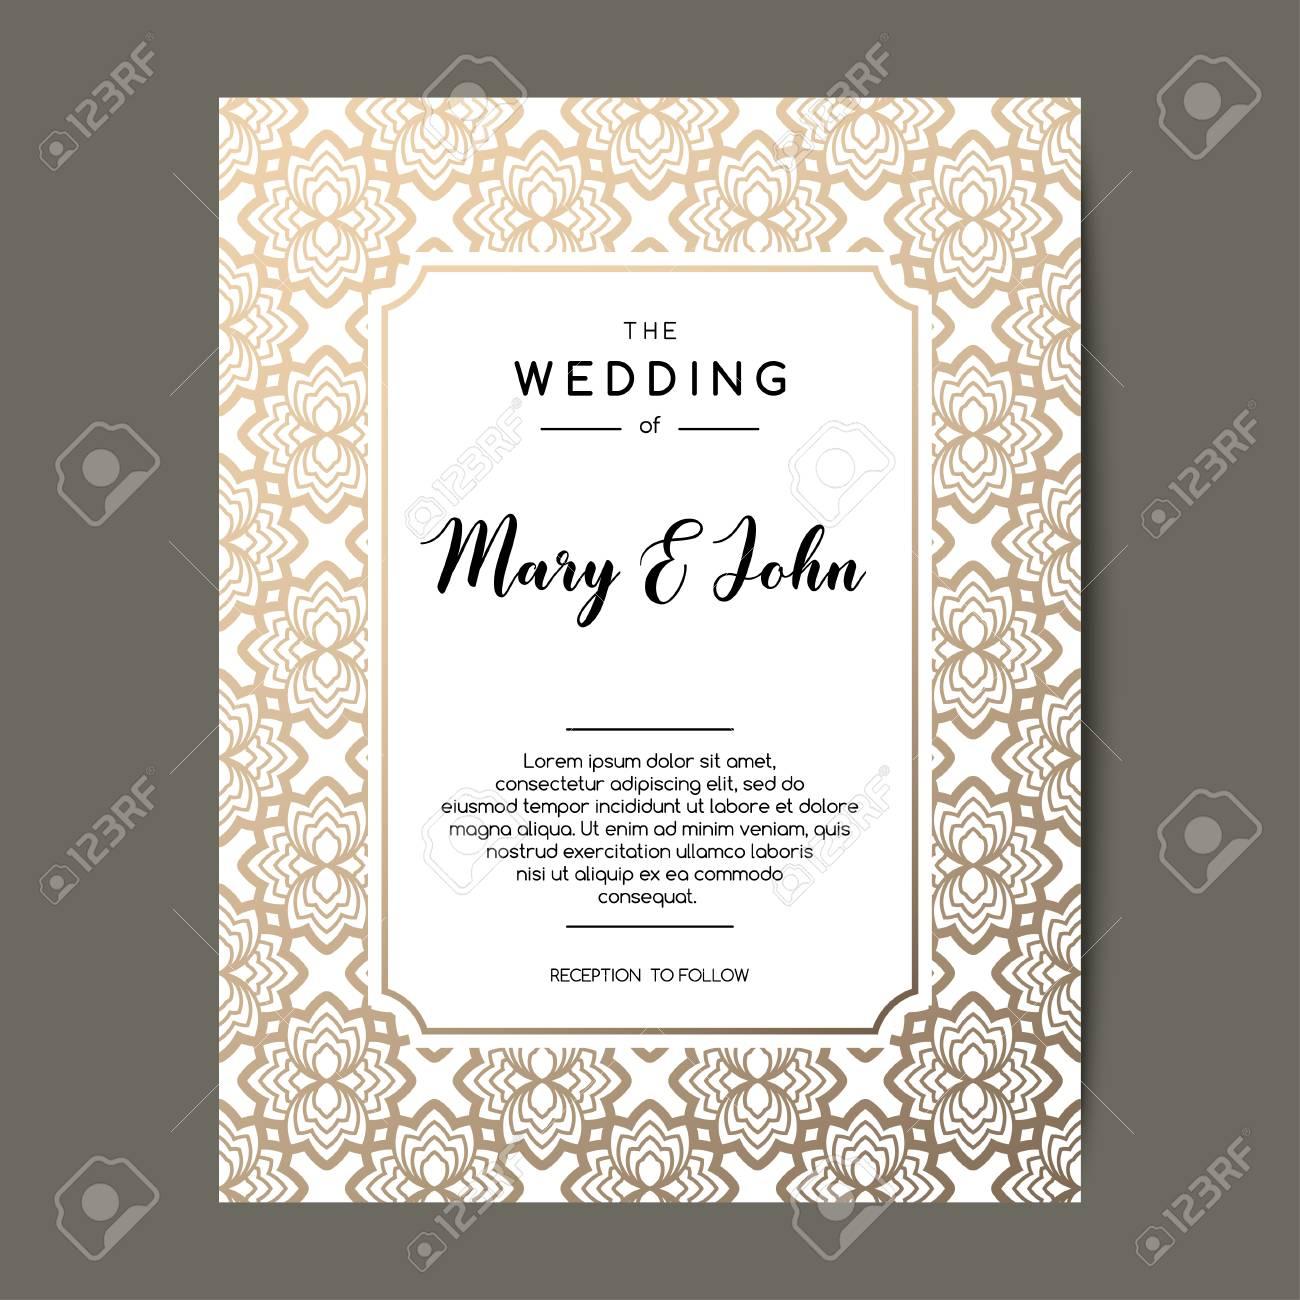 Fancy Wedding Invitations.Elegant Wedding Invitation Background Card Design With Gold